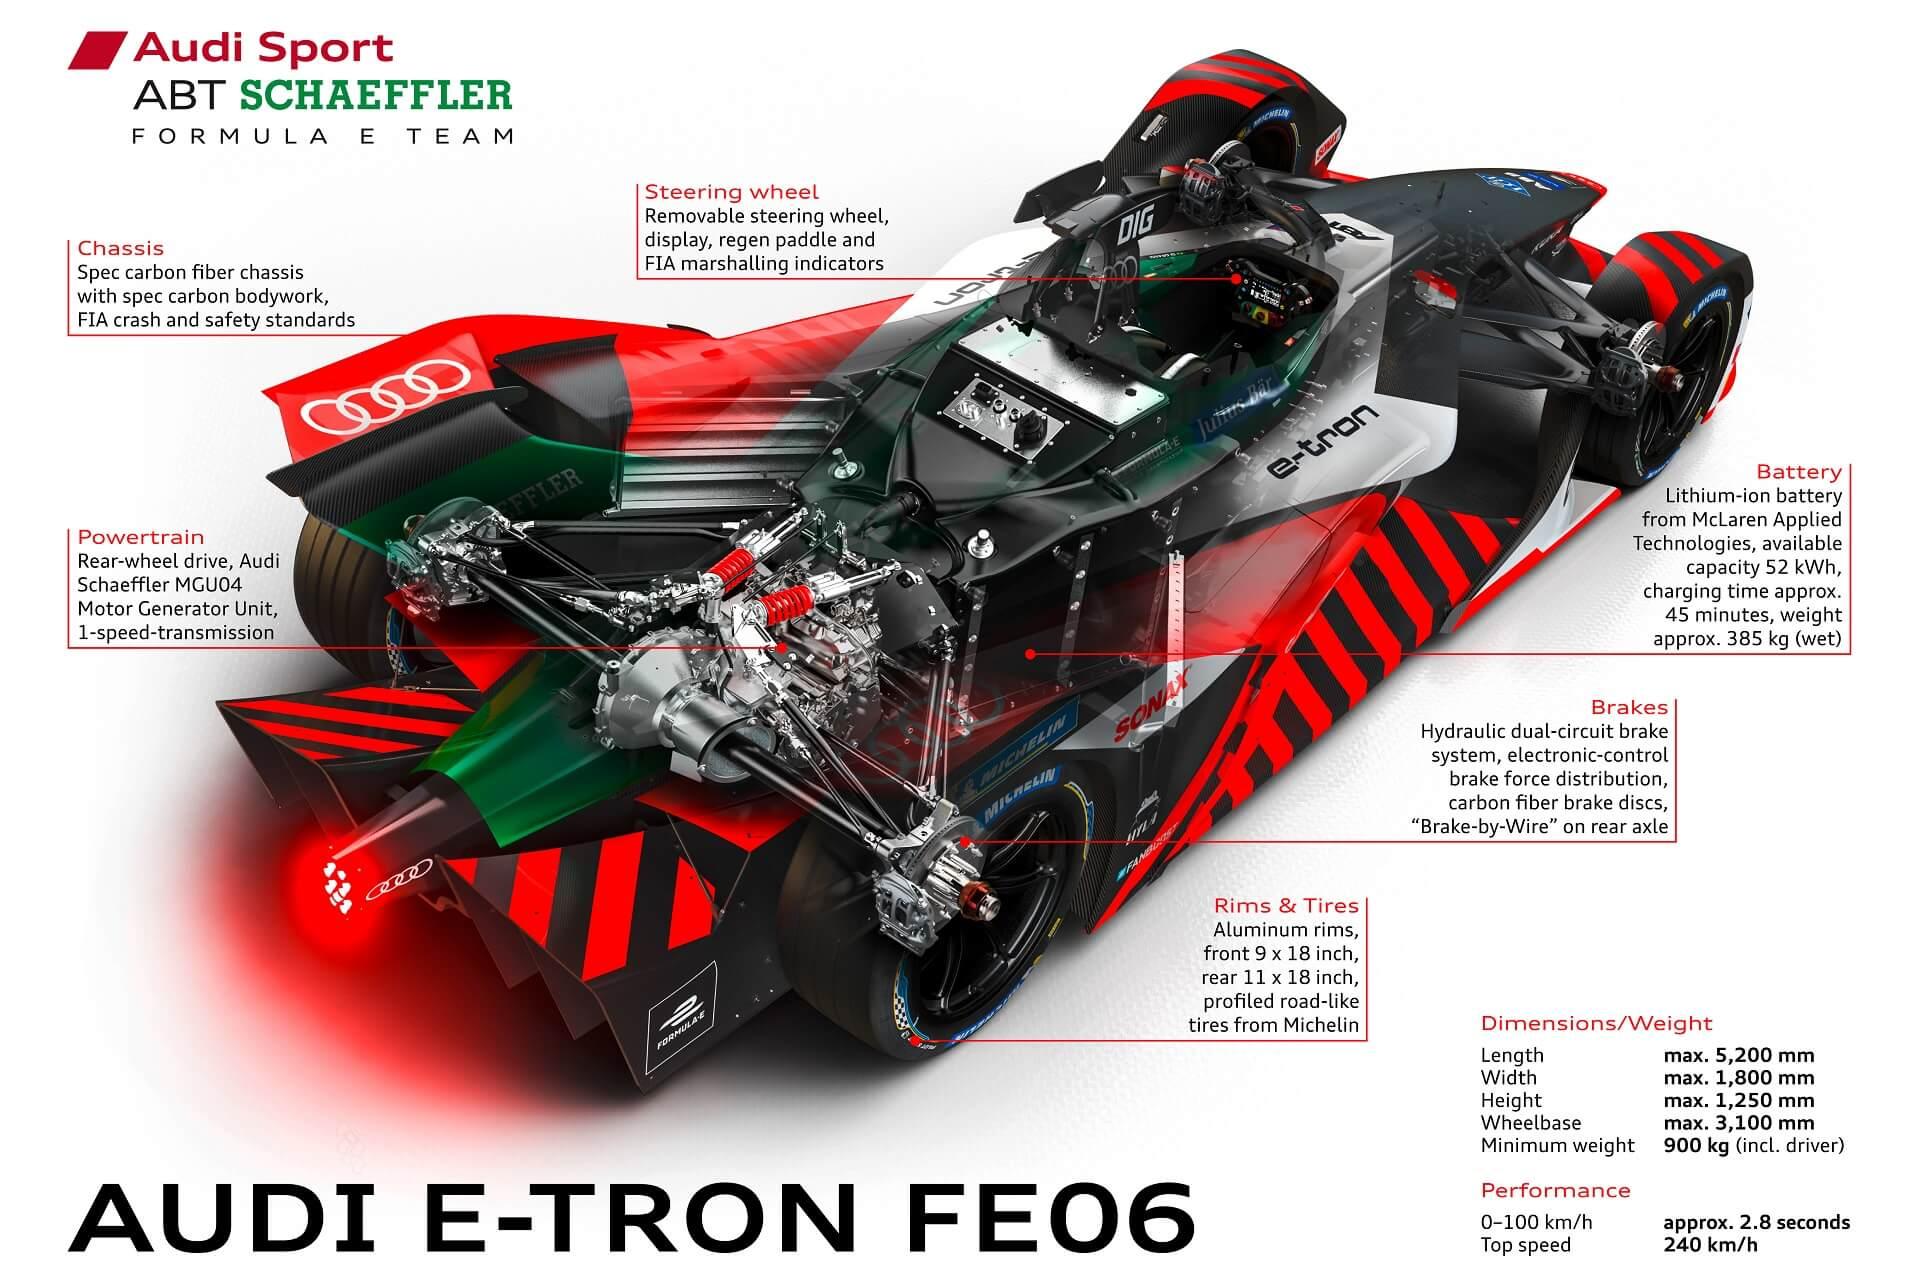 Audi e-tron FE06 - Τεχνικά Χαρακτηριστικά - Formula E